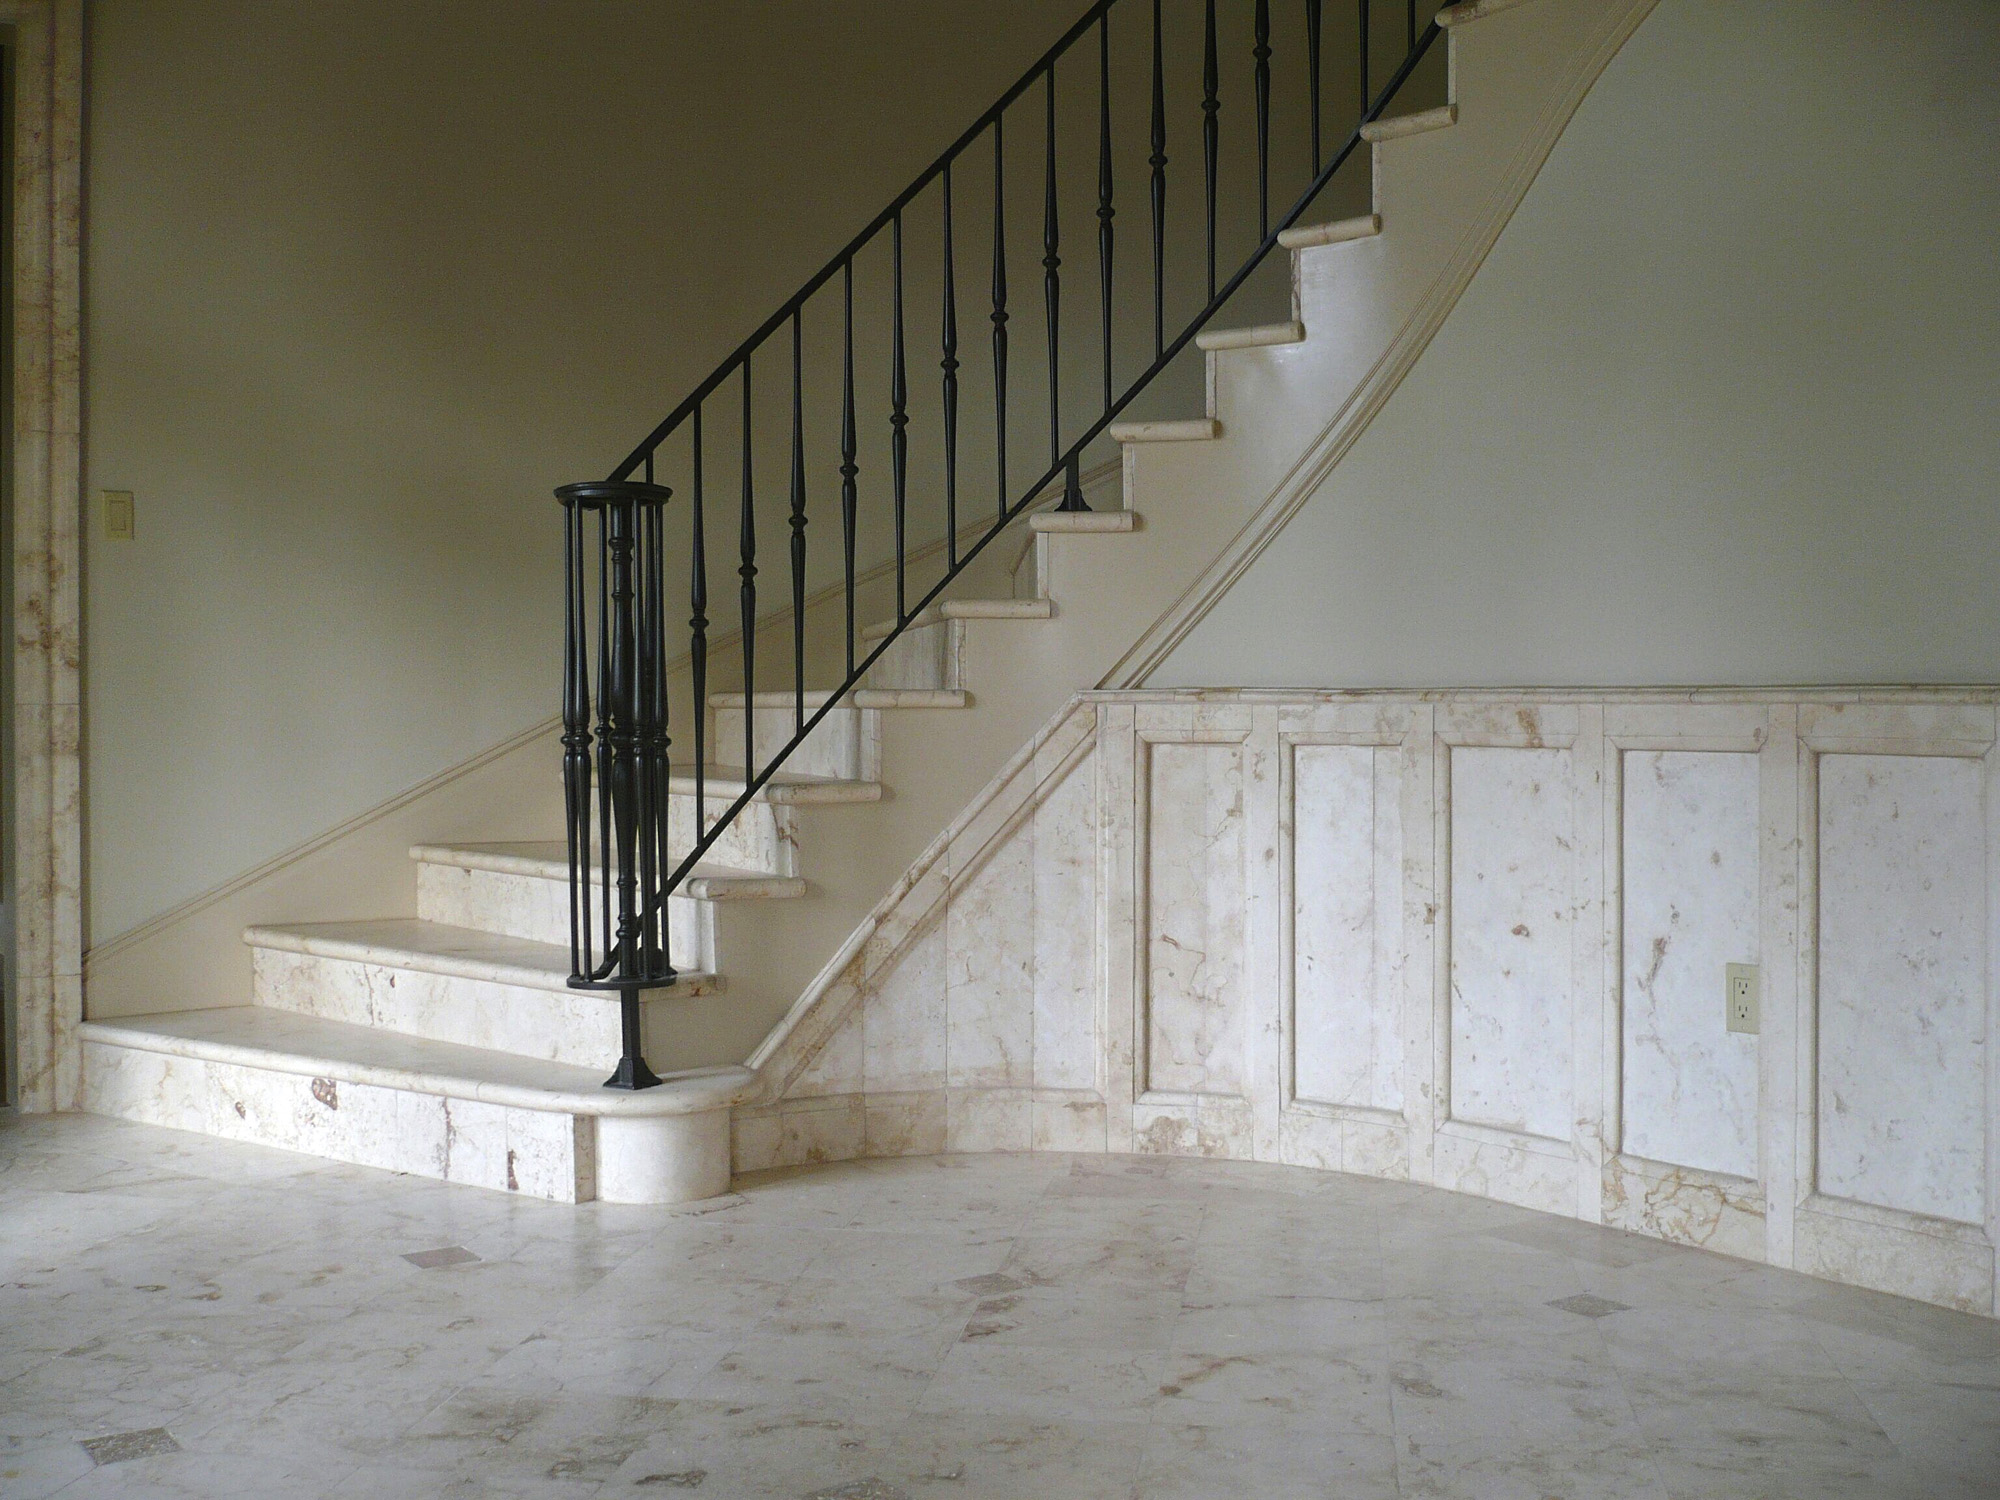 BF_Stairsfoyer_2000x1500_2007.6.20_0049.jpg